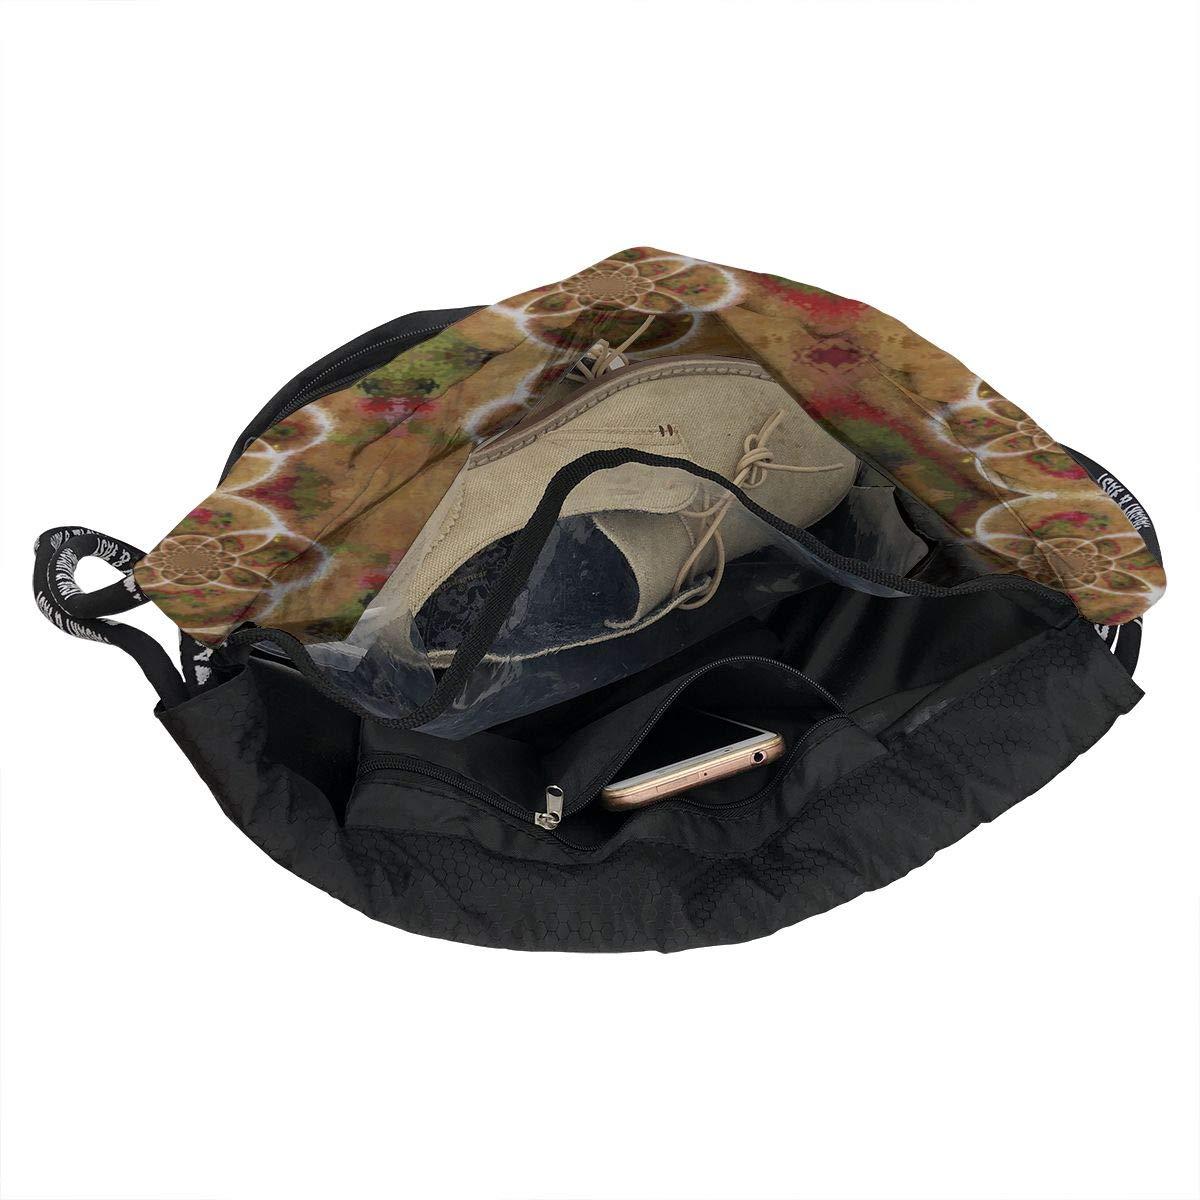 Oriental Dragon Circle Drawstring Backpack Sports Athletic Gym Cinch Sack String Storage Bags for Hiking Travel Beach